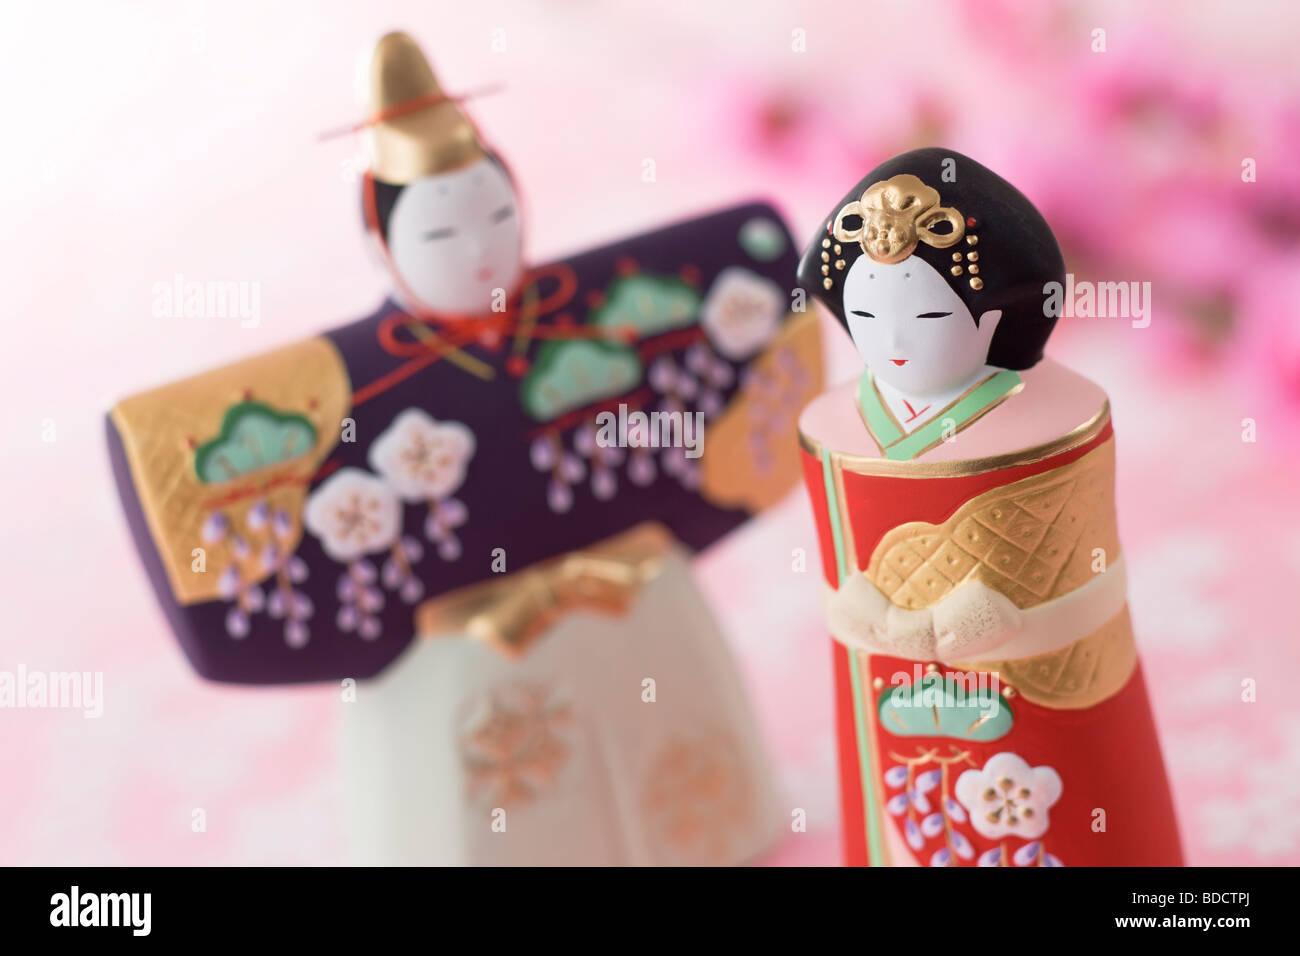 Japanese hinamatsuri doll - Stock Image